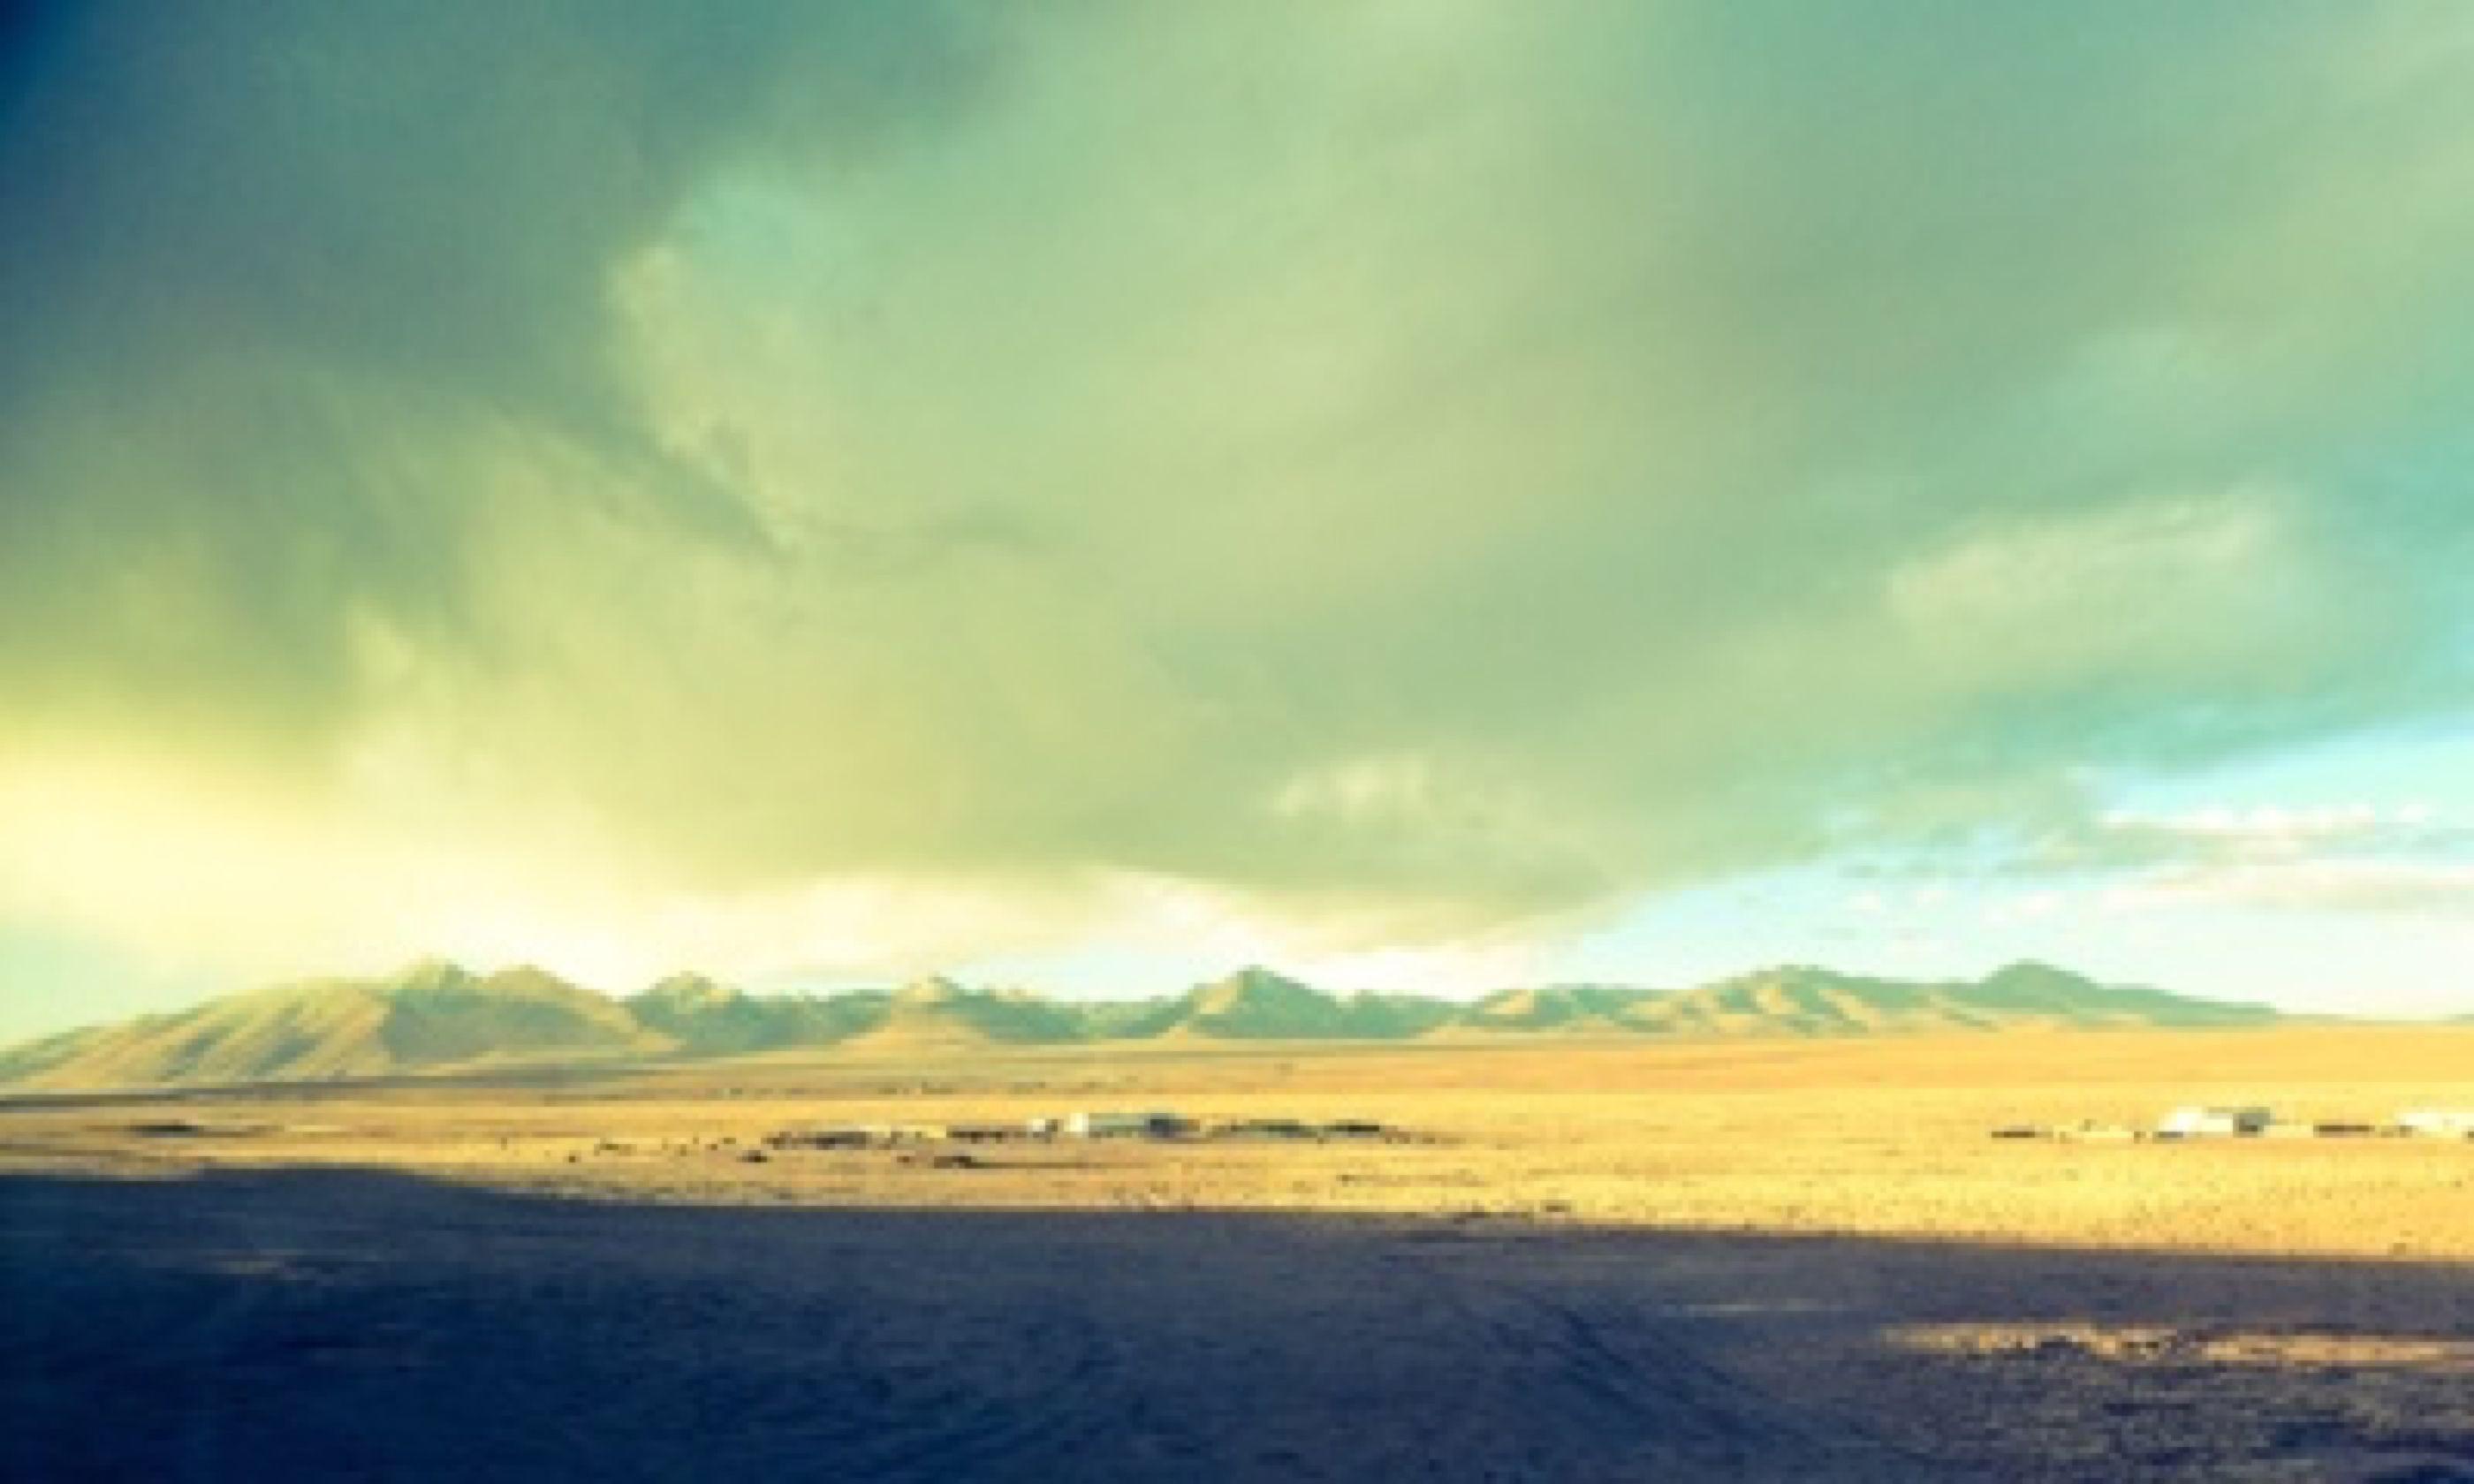 Tibetan plateau (Matthew Woodward)